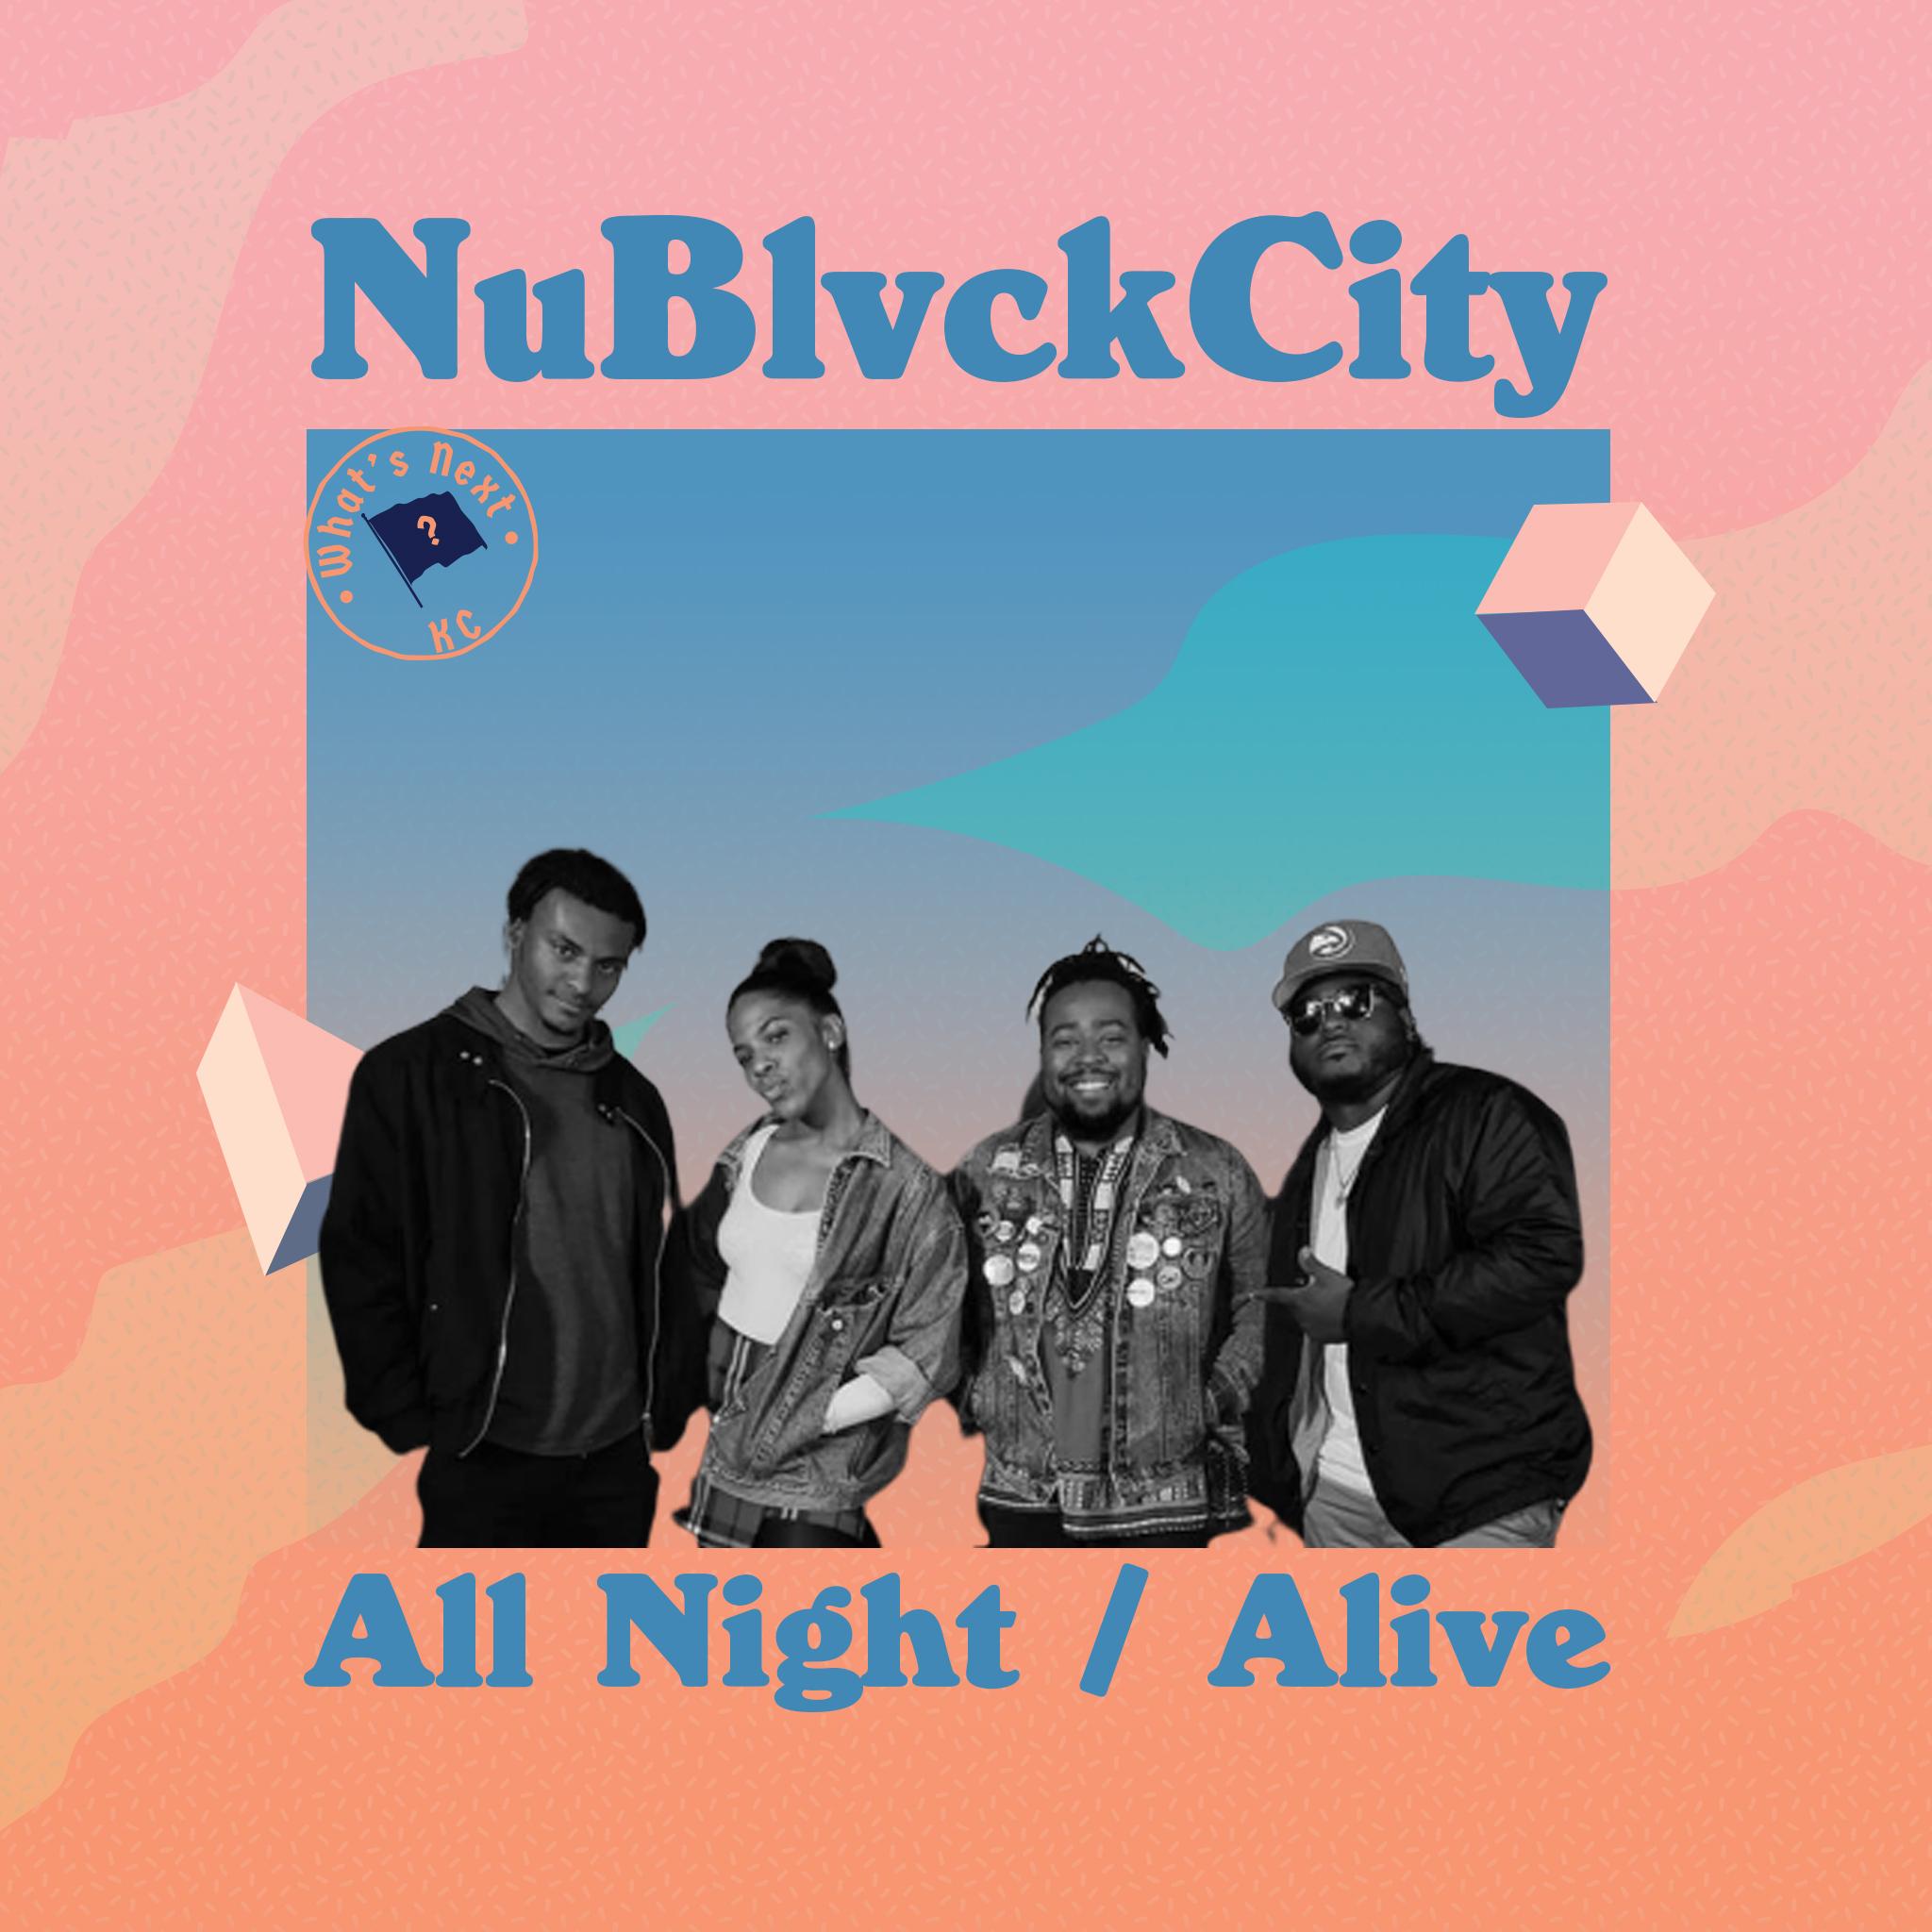 nublvckcity album art.jpg